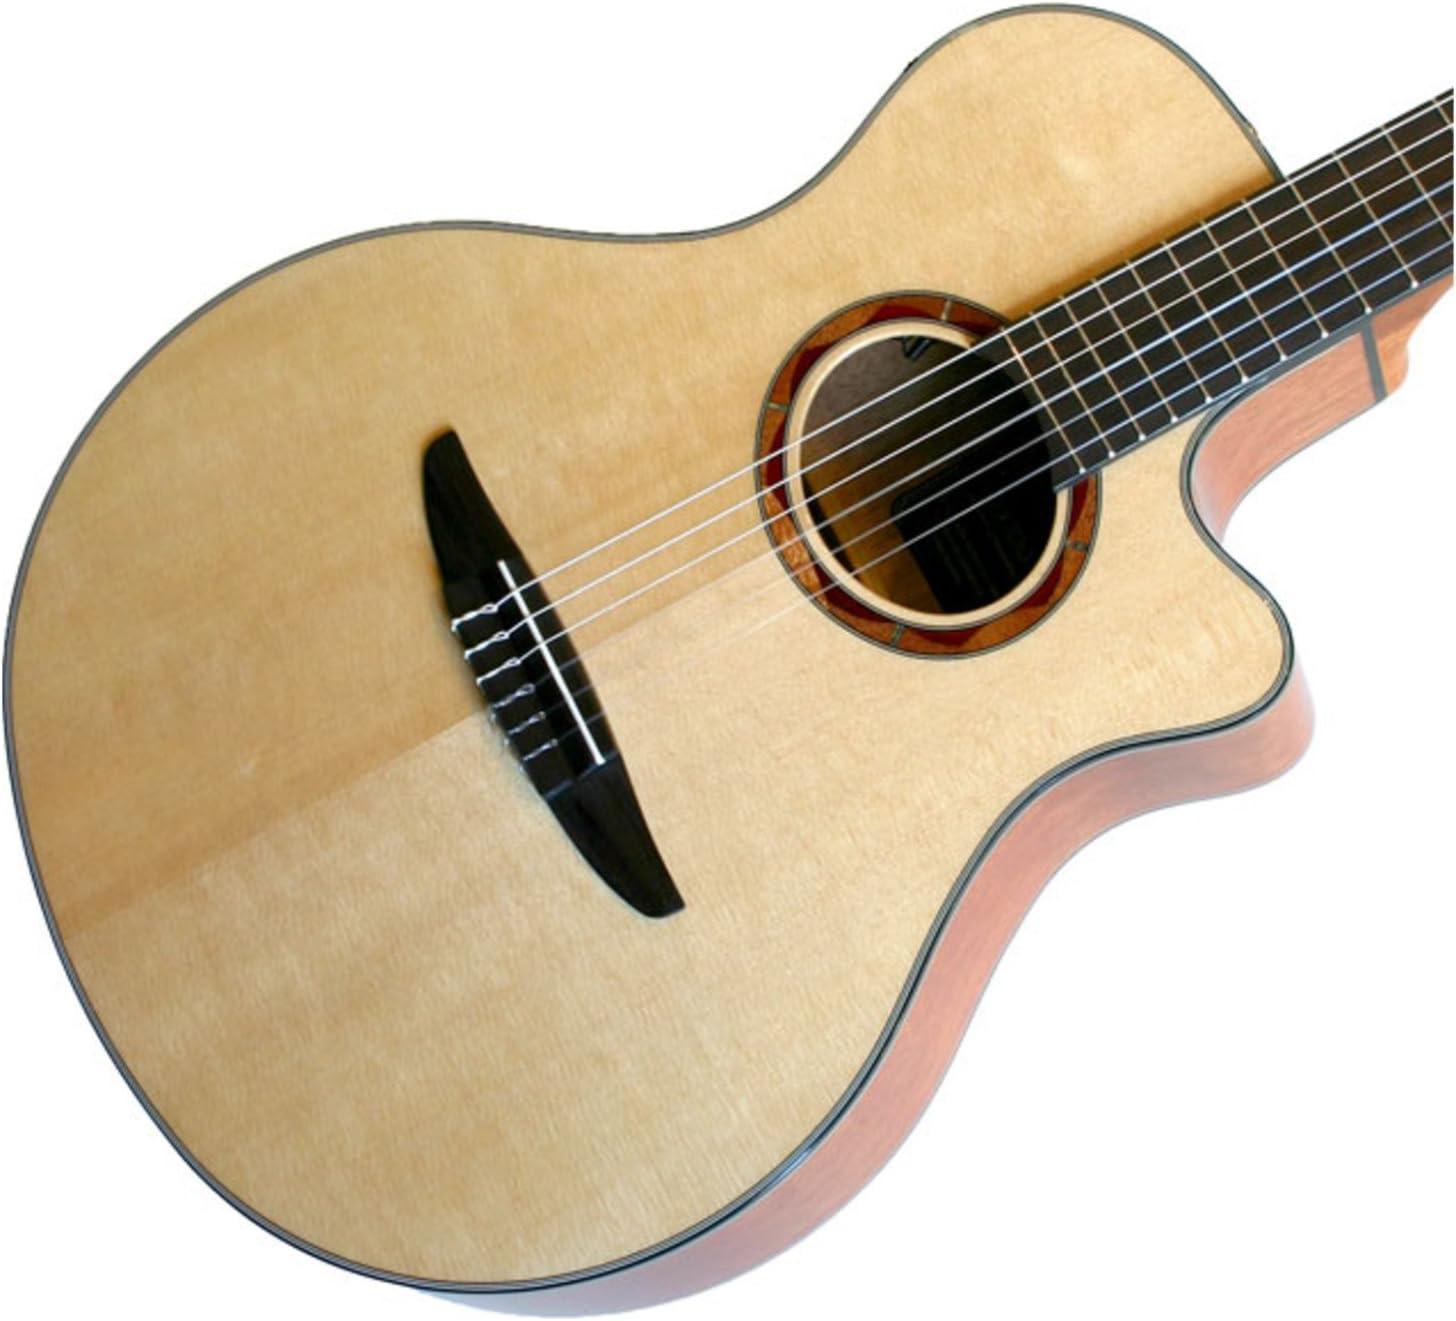 Yamaha ntx700 NTX guitarra electroacústica clásica guitarra w ...